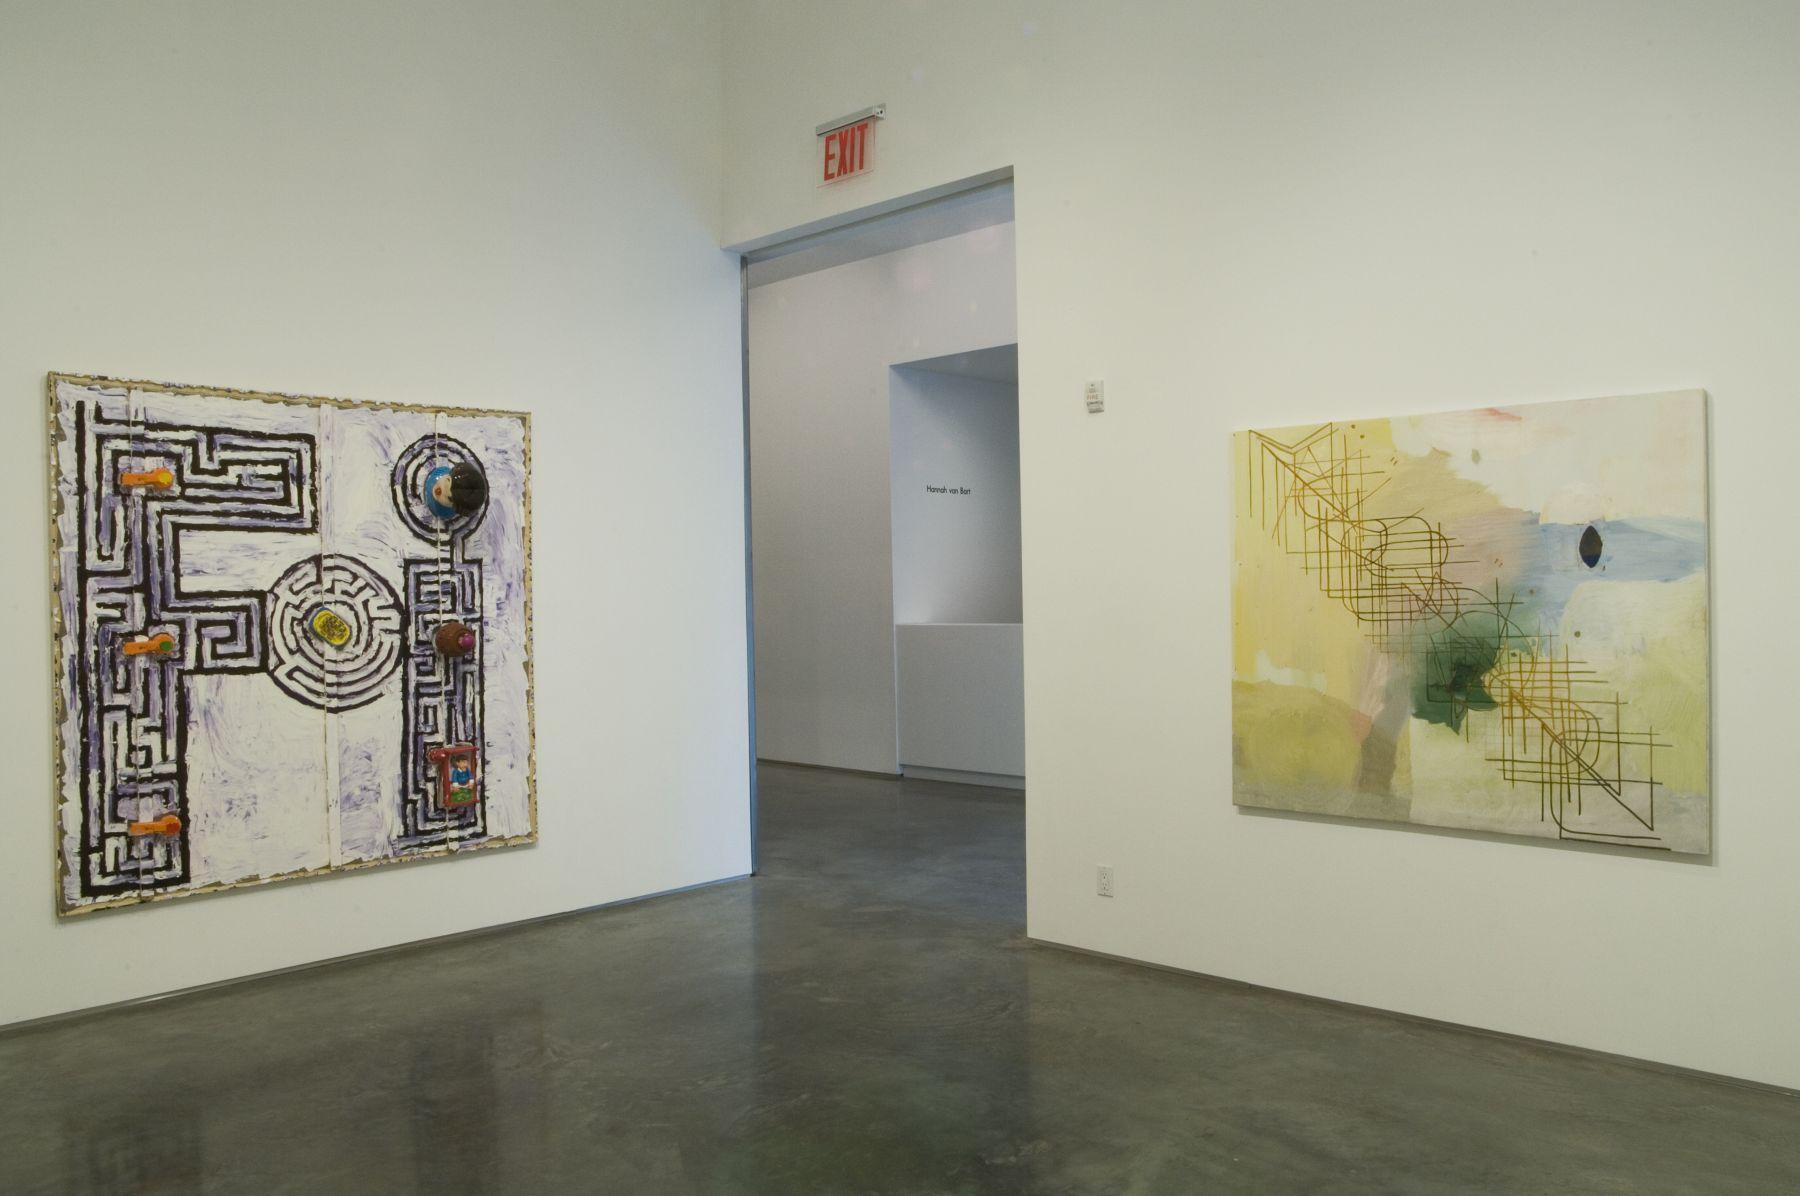 Installation View, Marianne Boesky Gallery, 2007